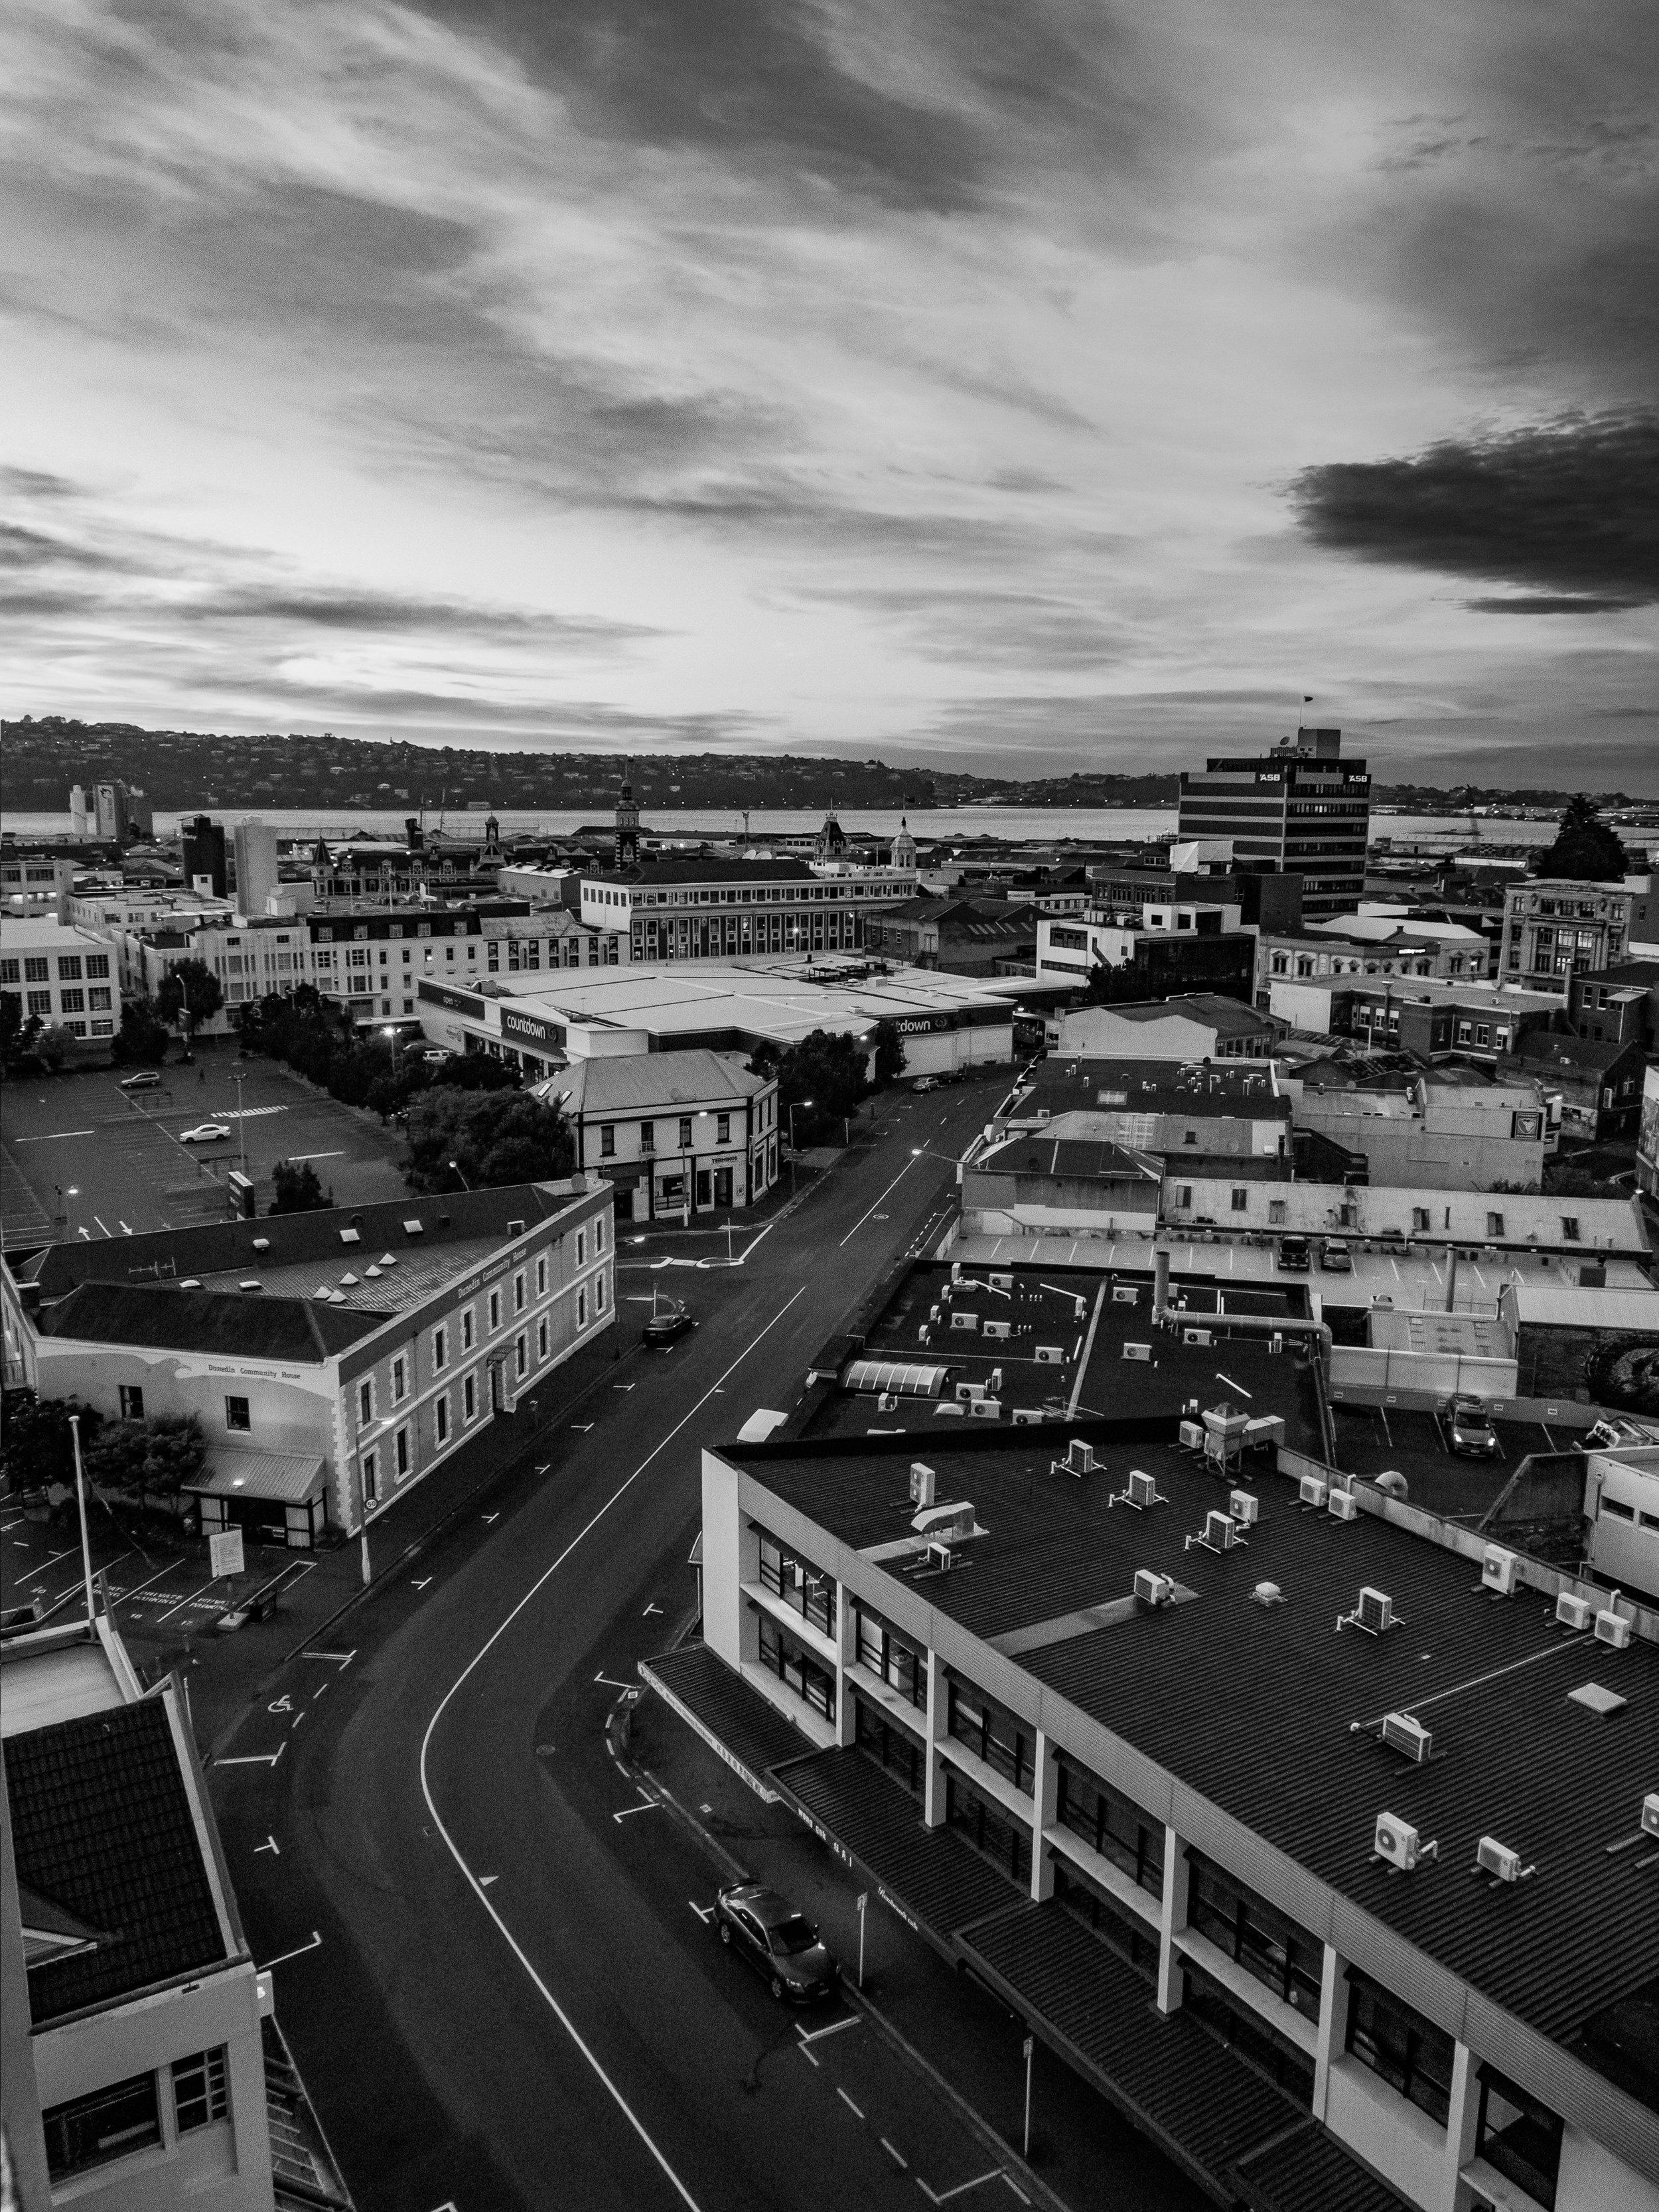 Sunrise over Dunedin City in black and white